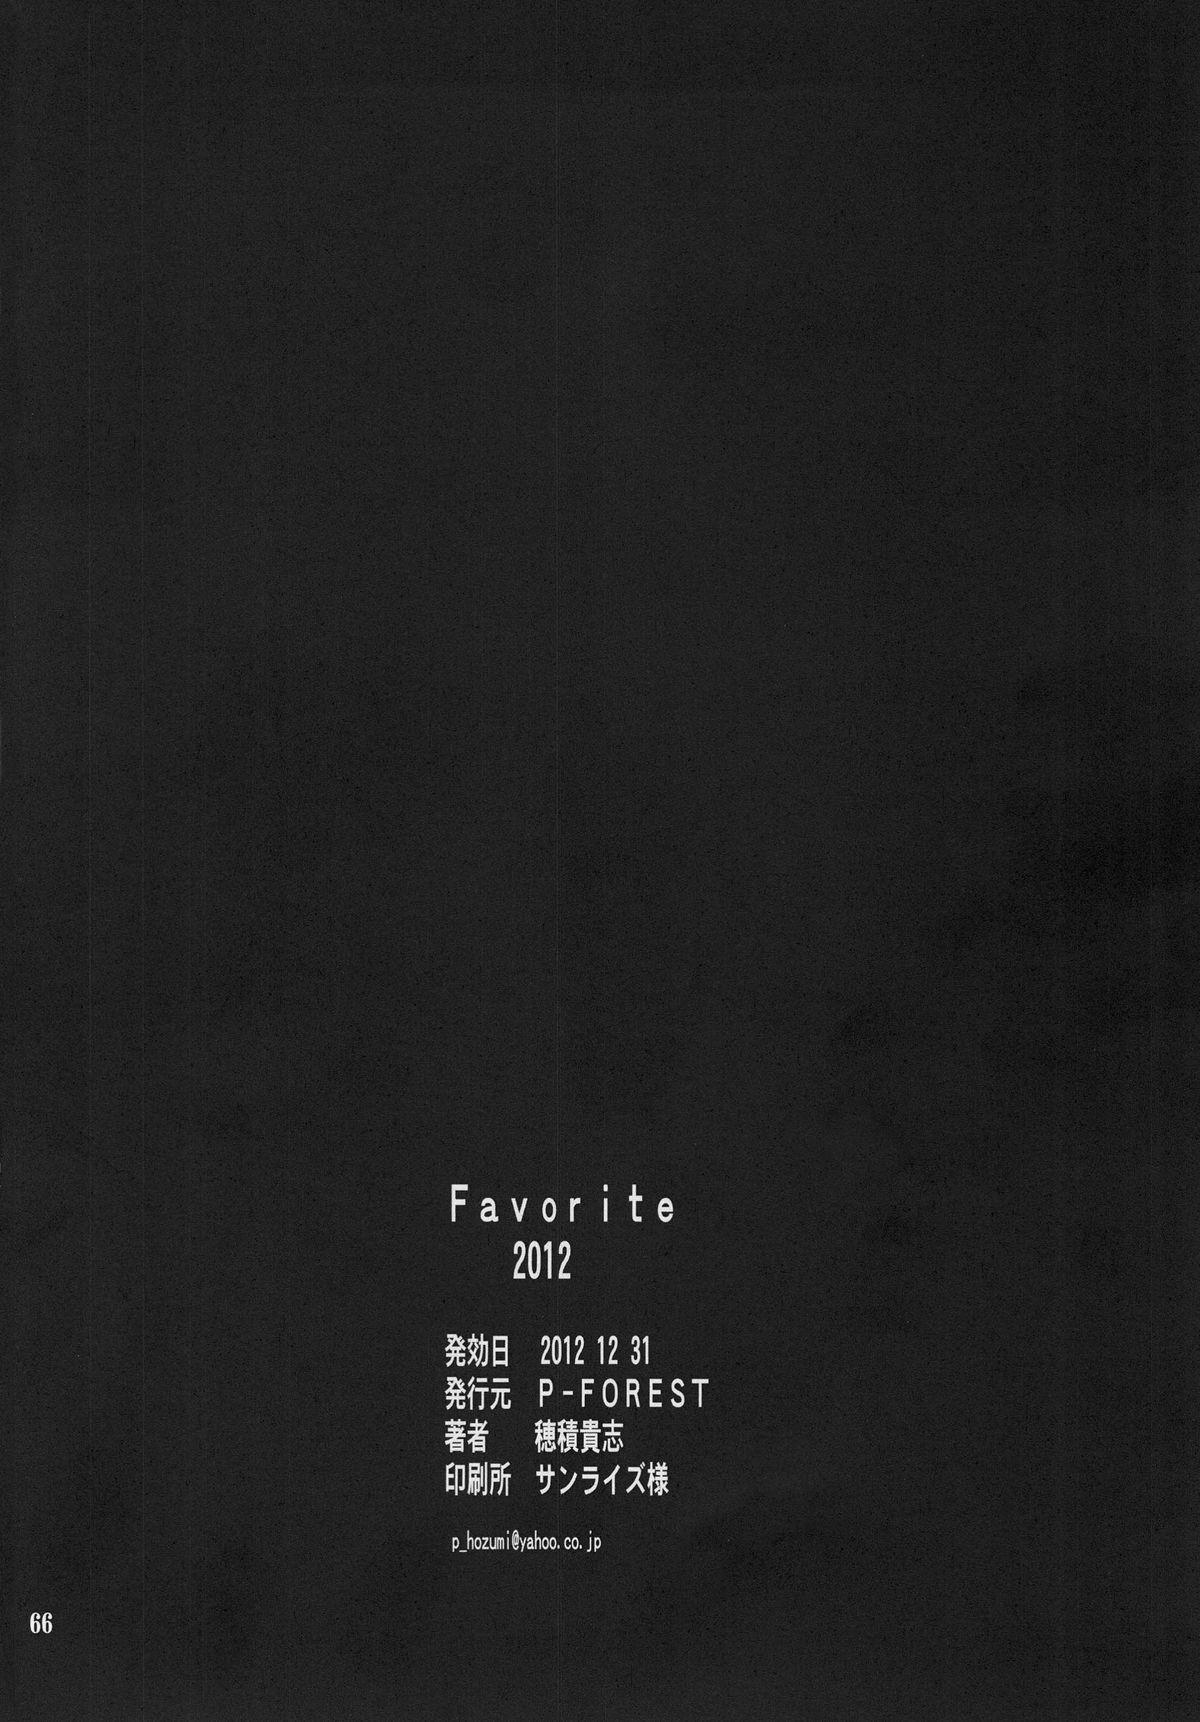 Favorite 2012 65